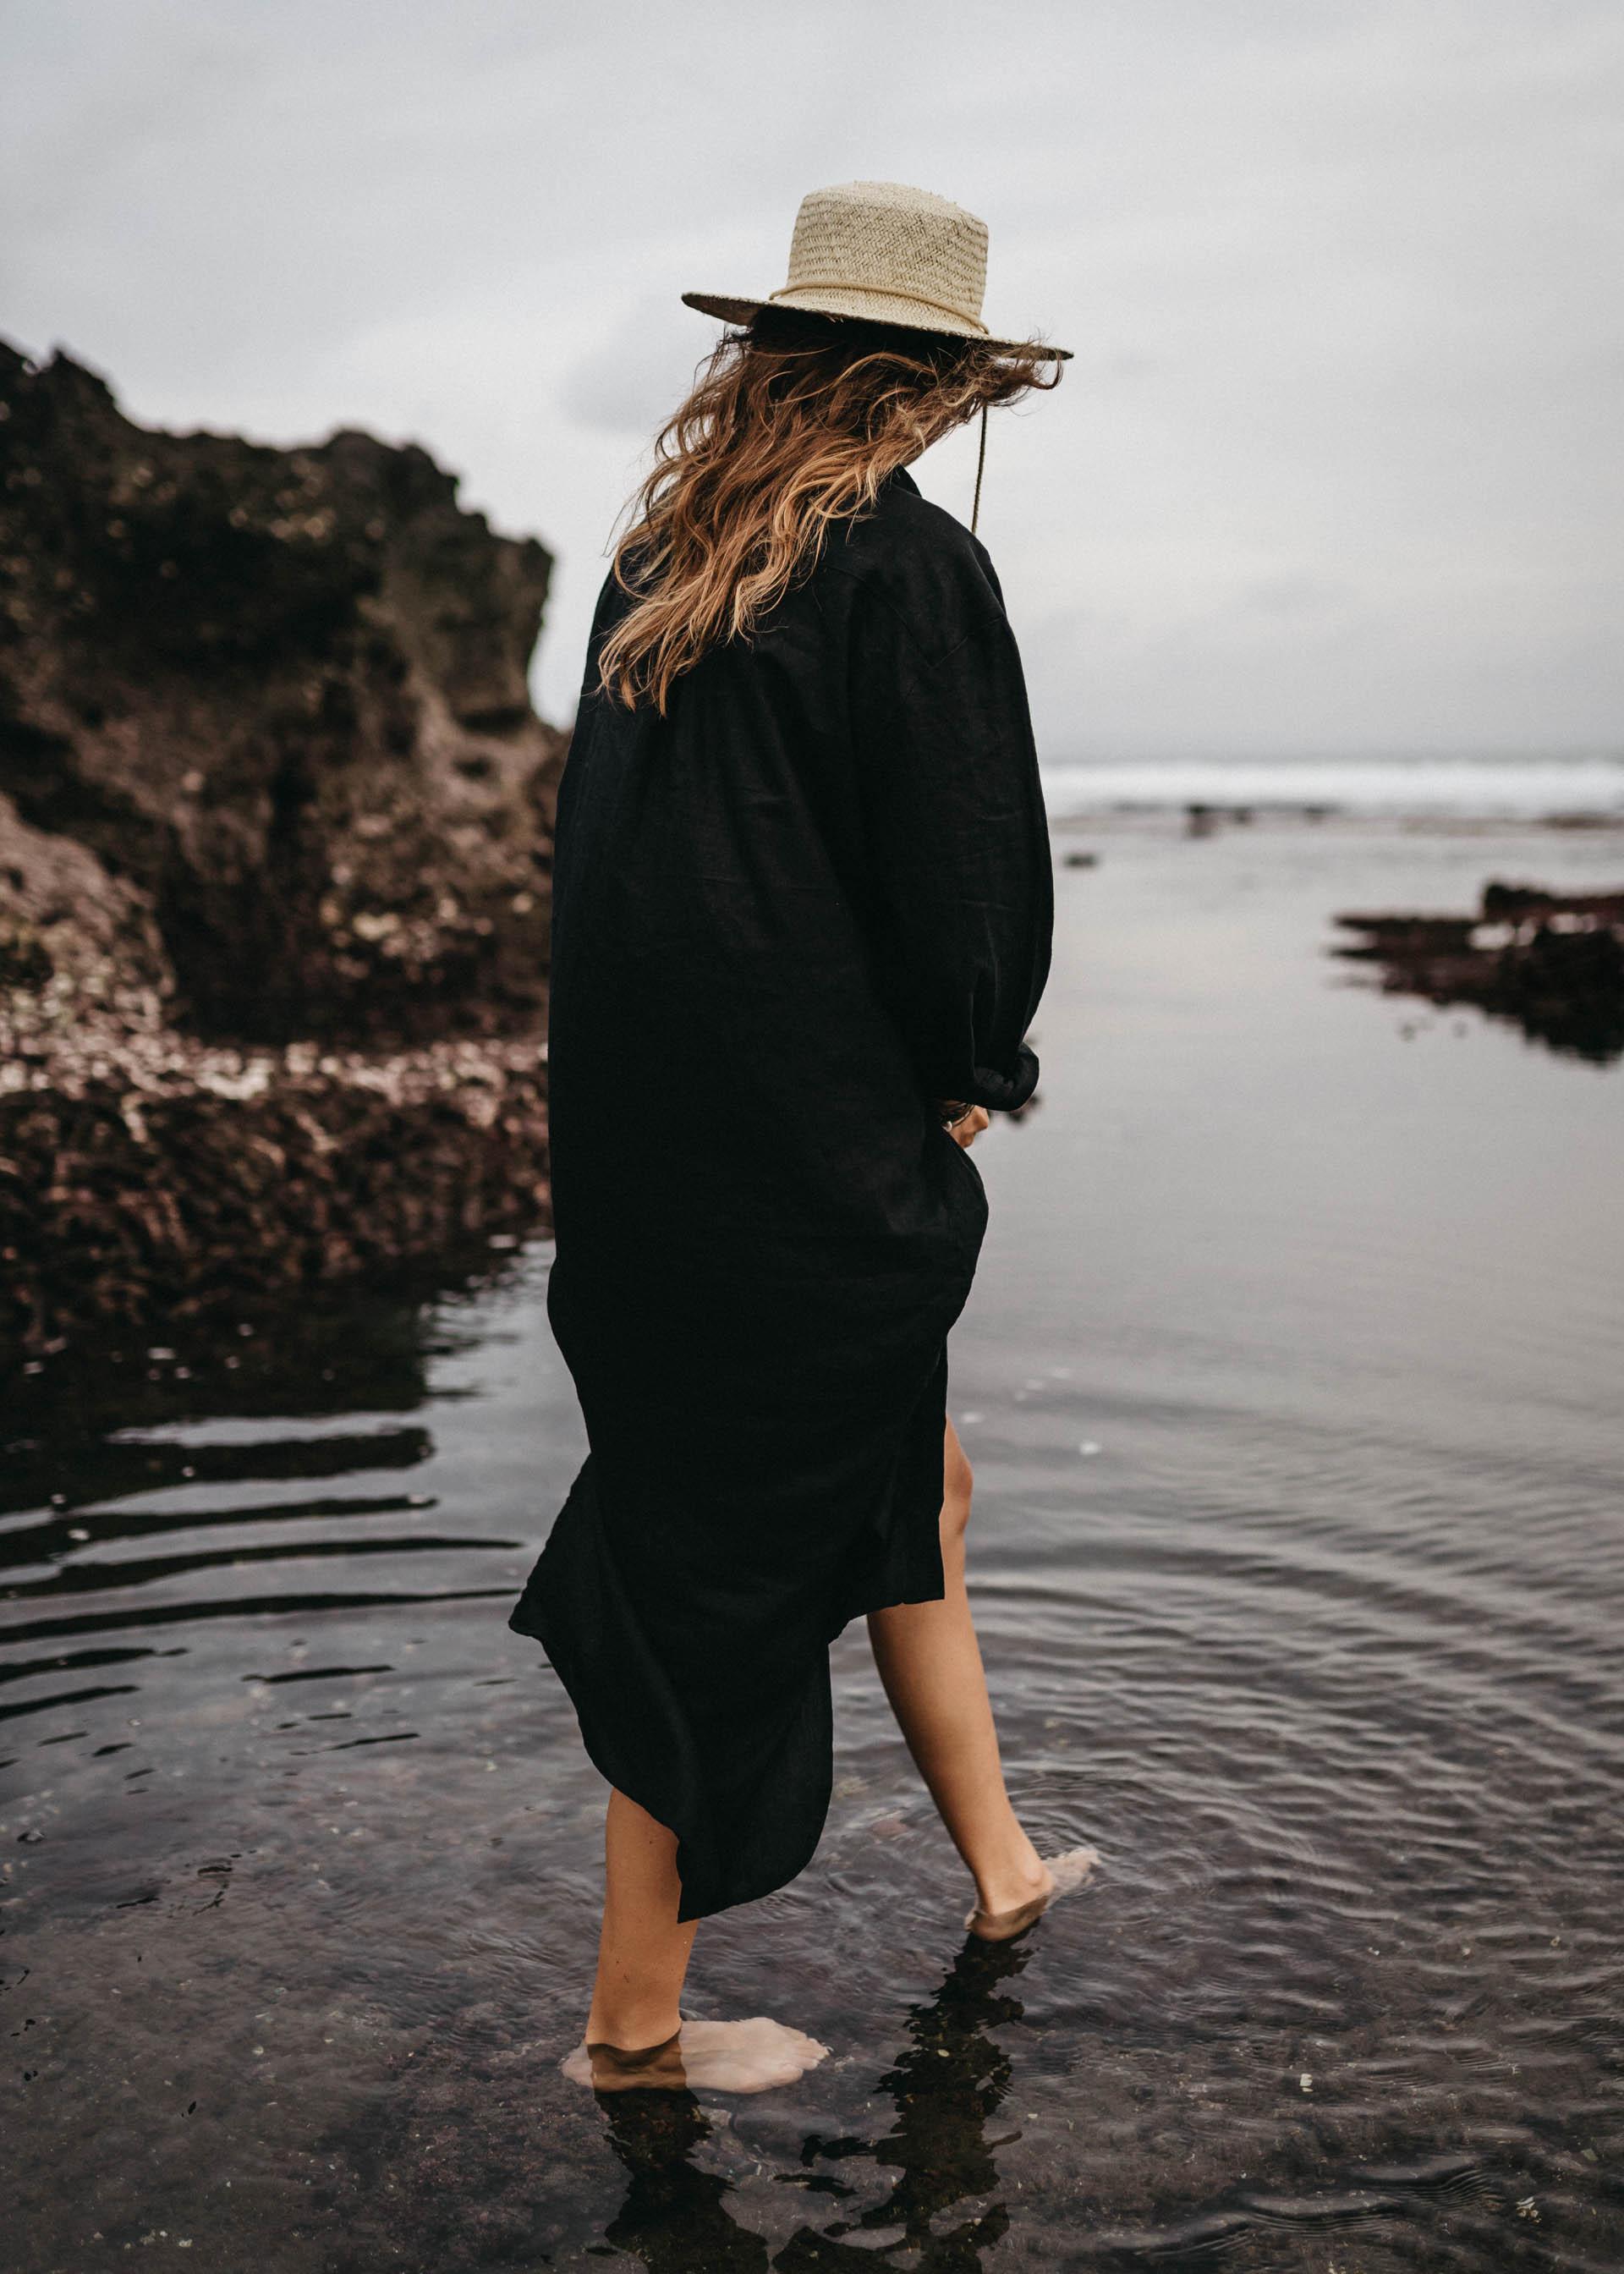 keira-mason-studio-karma-beach-black-dress-straw-hat.jpg